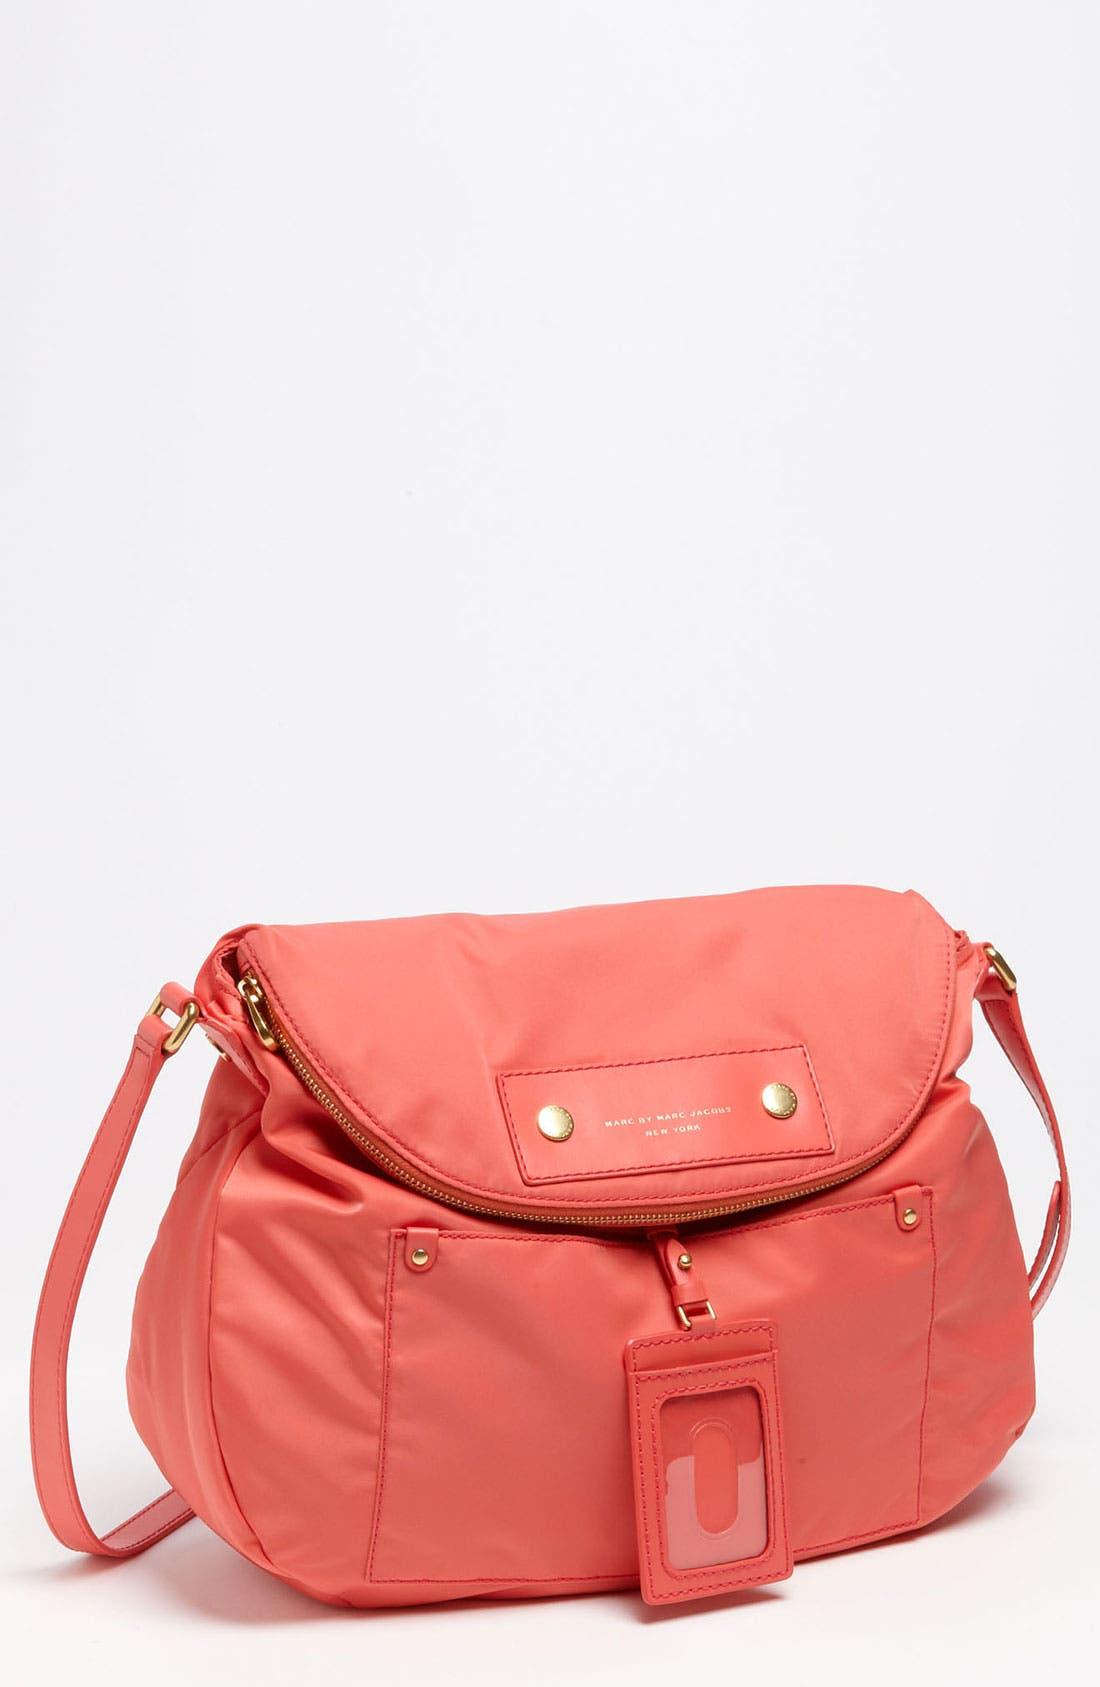 Main Image - MARC BY MARC JACOBS 'Preppy Nylon Sasha' Crossbody Bag